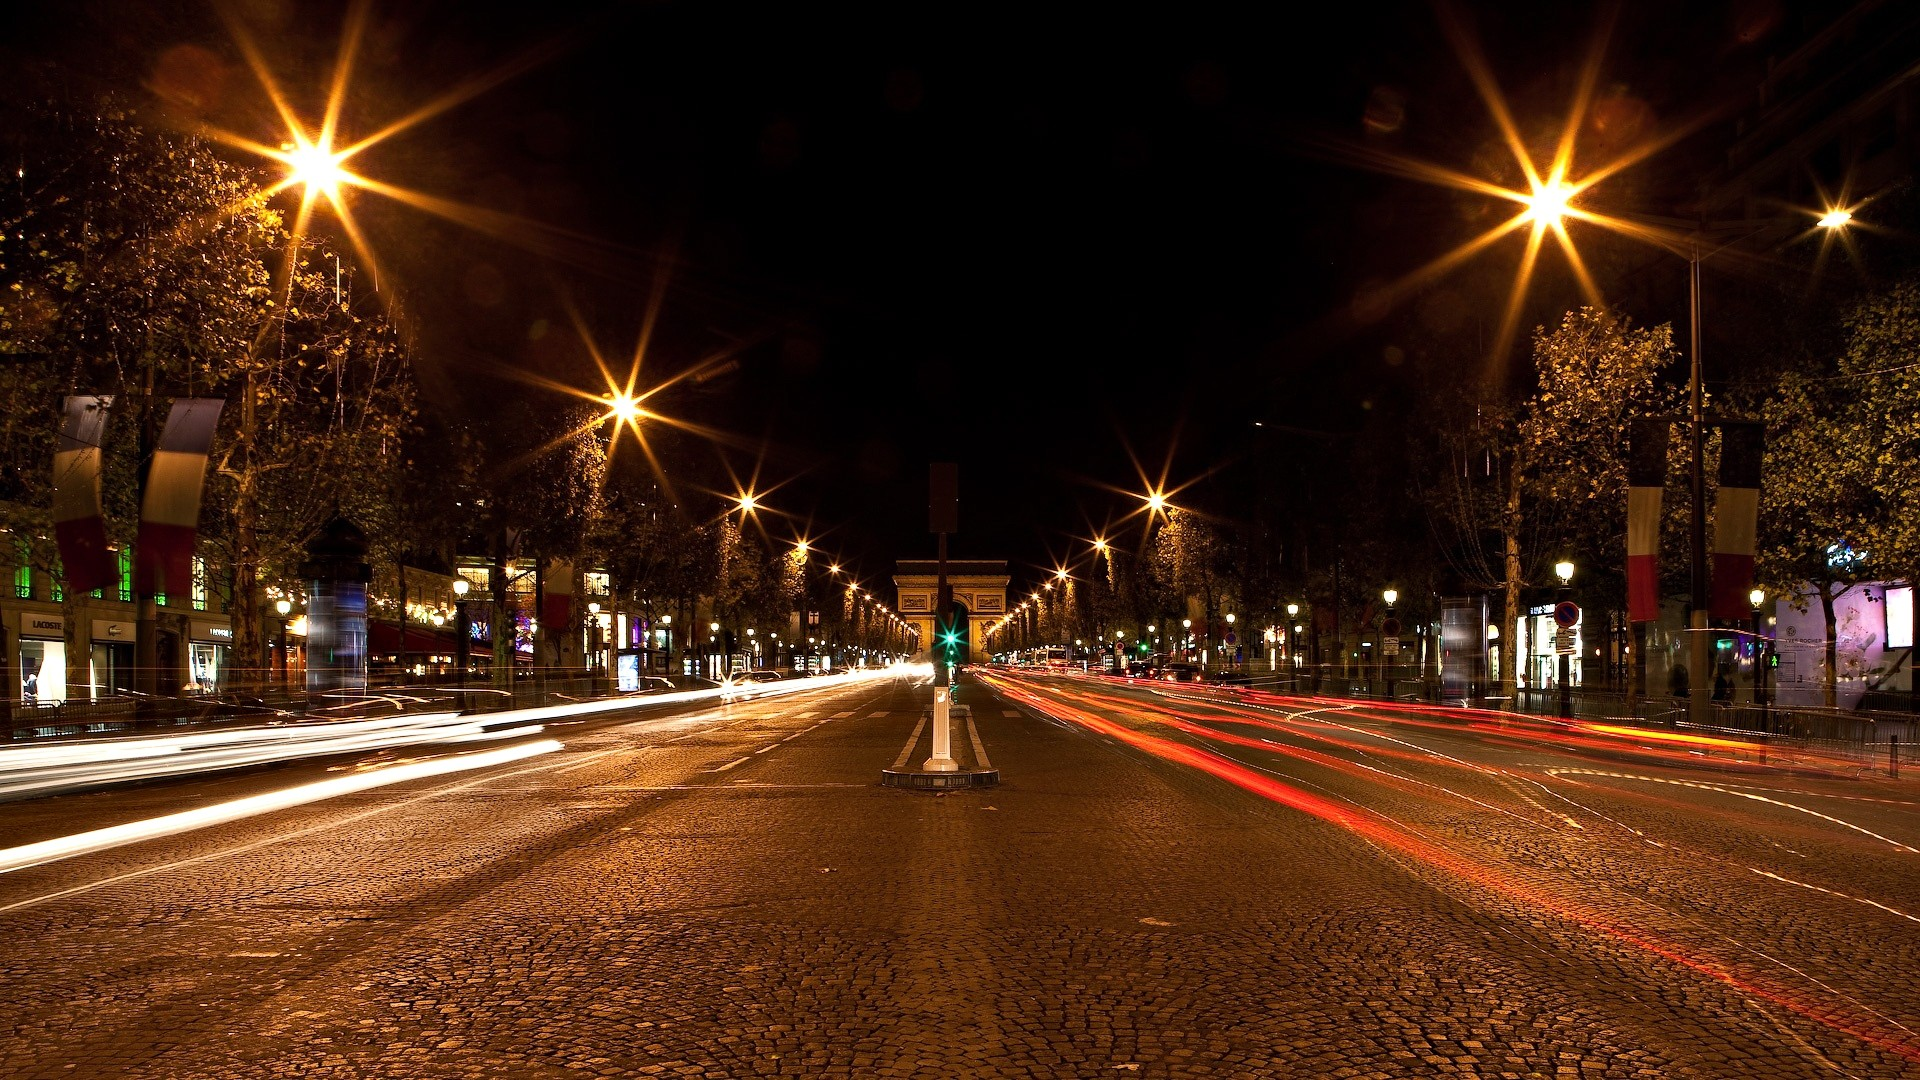 Street wallpaper hd night city 66 images - Night light hd wallpaper ...